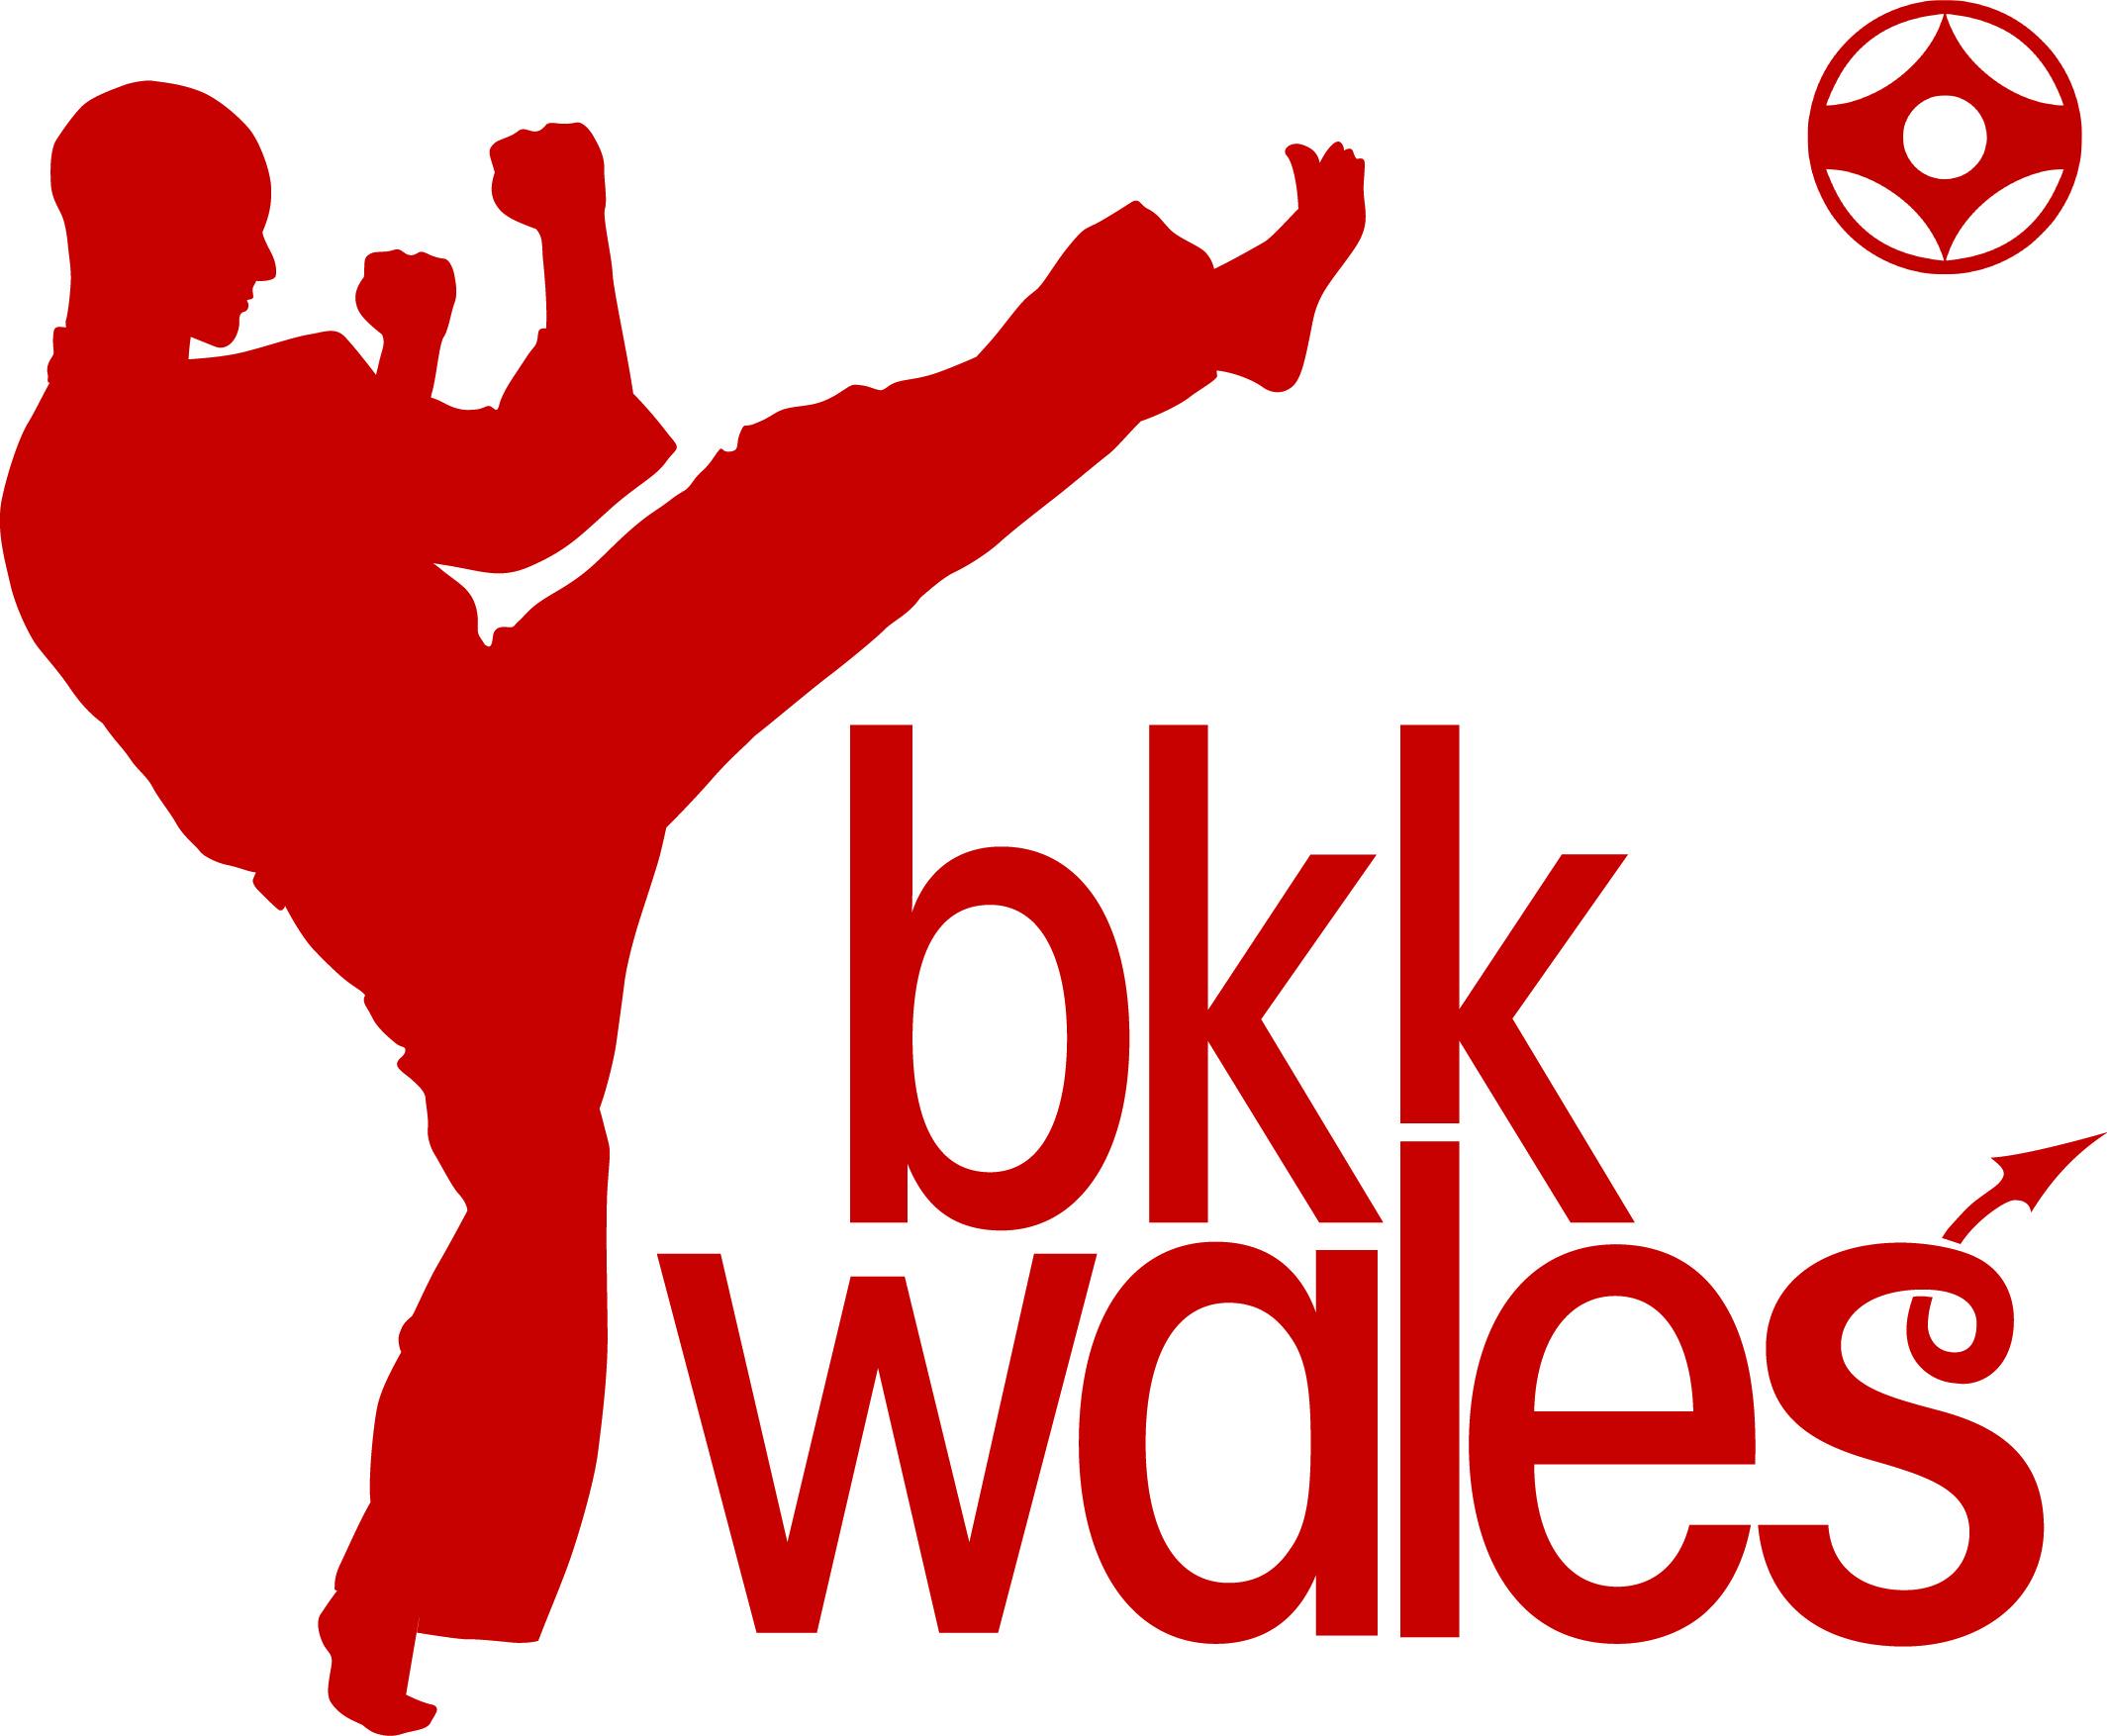 BKK Wales